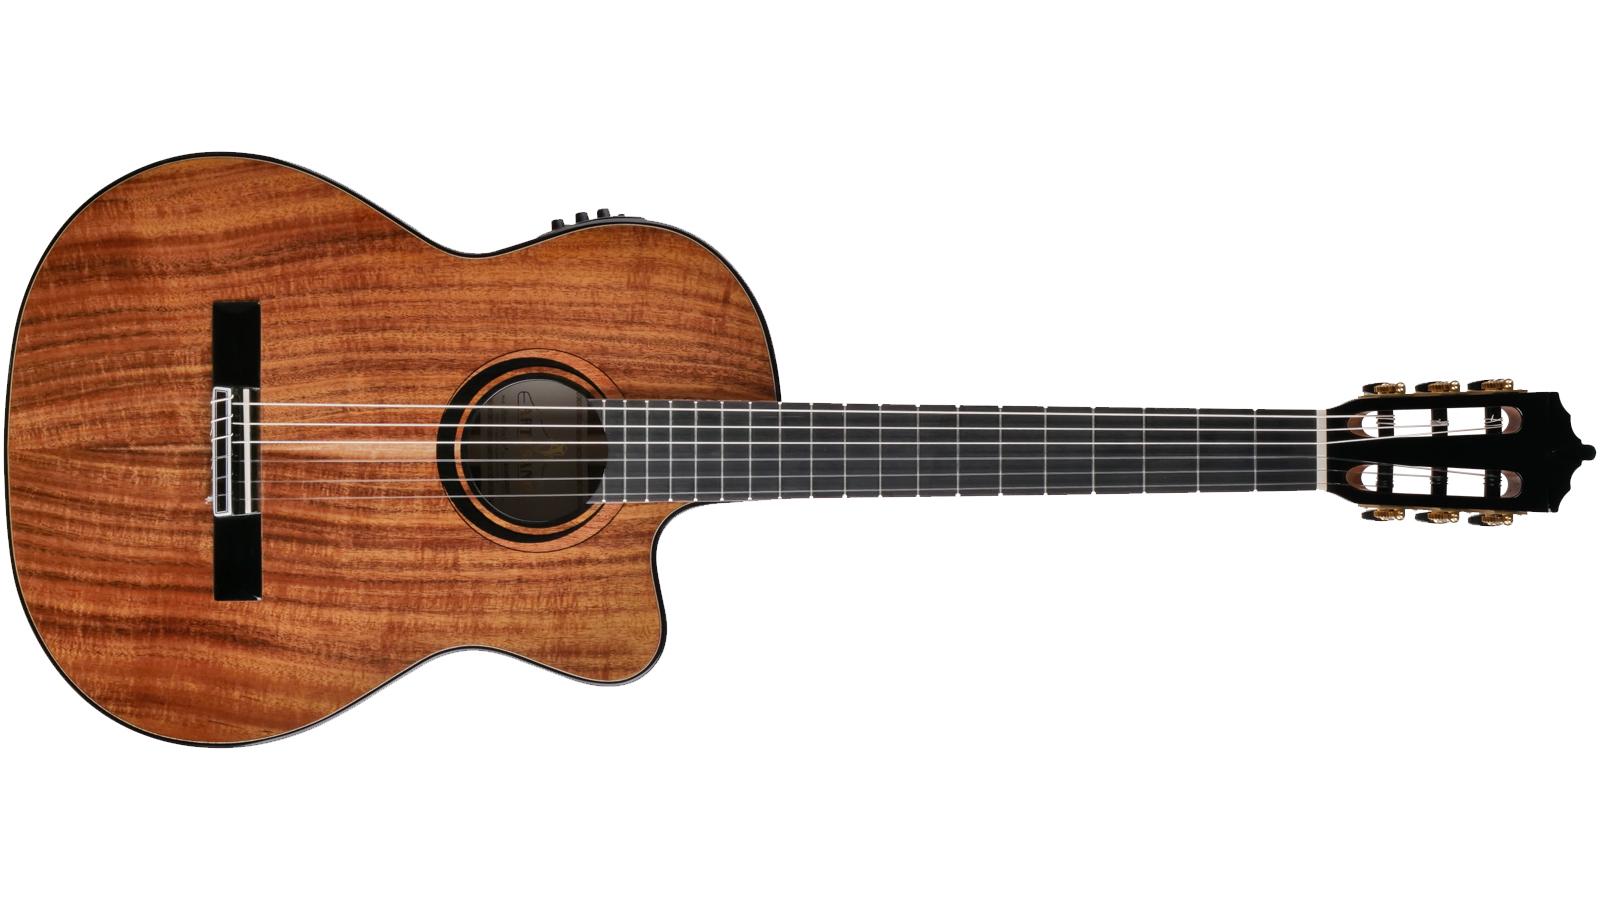 Artesano Nuevo Koa Cut Konzertgitarre